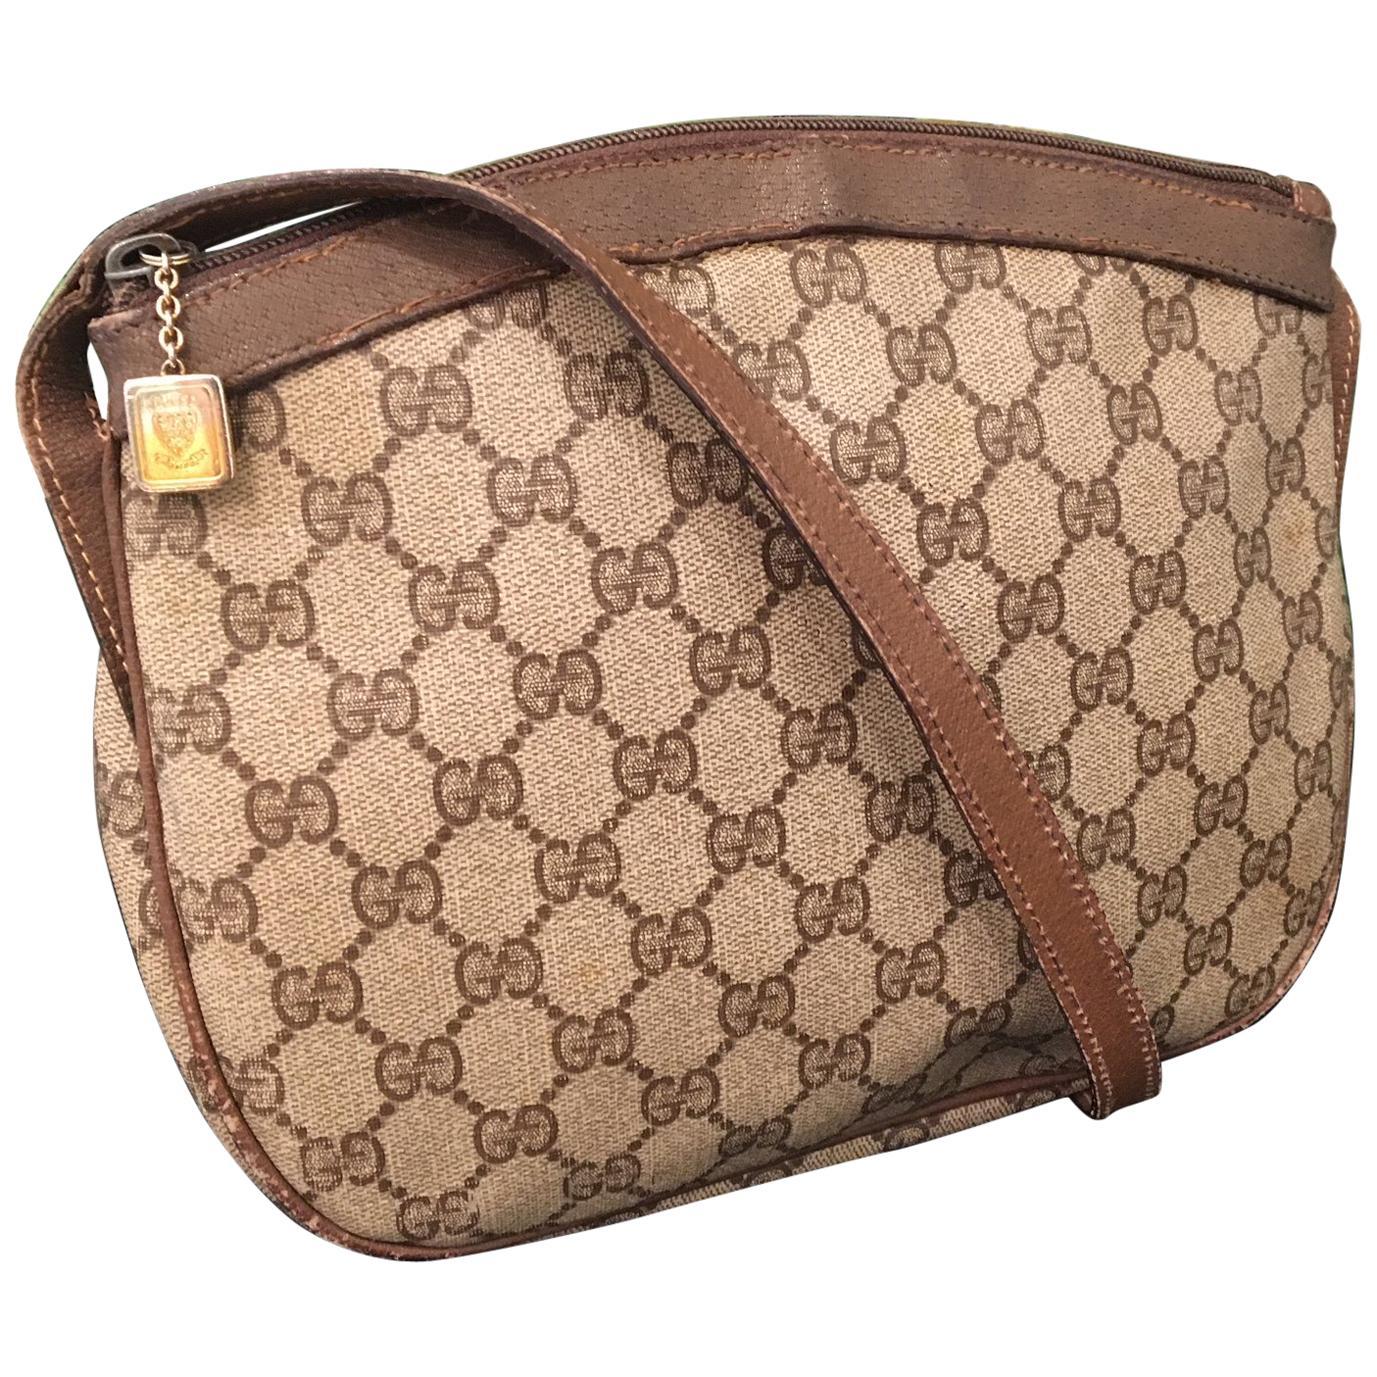 "Vintage Gucci 1980s Signature ""GG"" Crossbody Handbag"